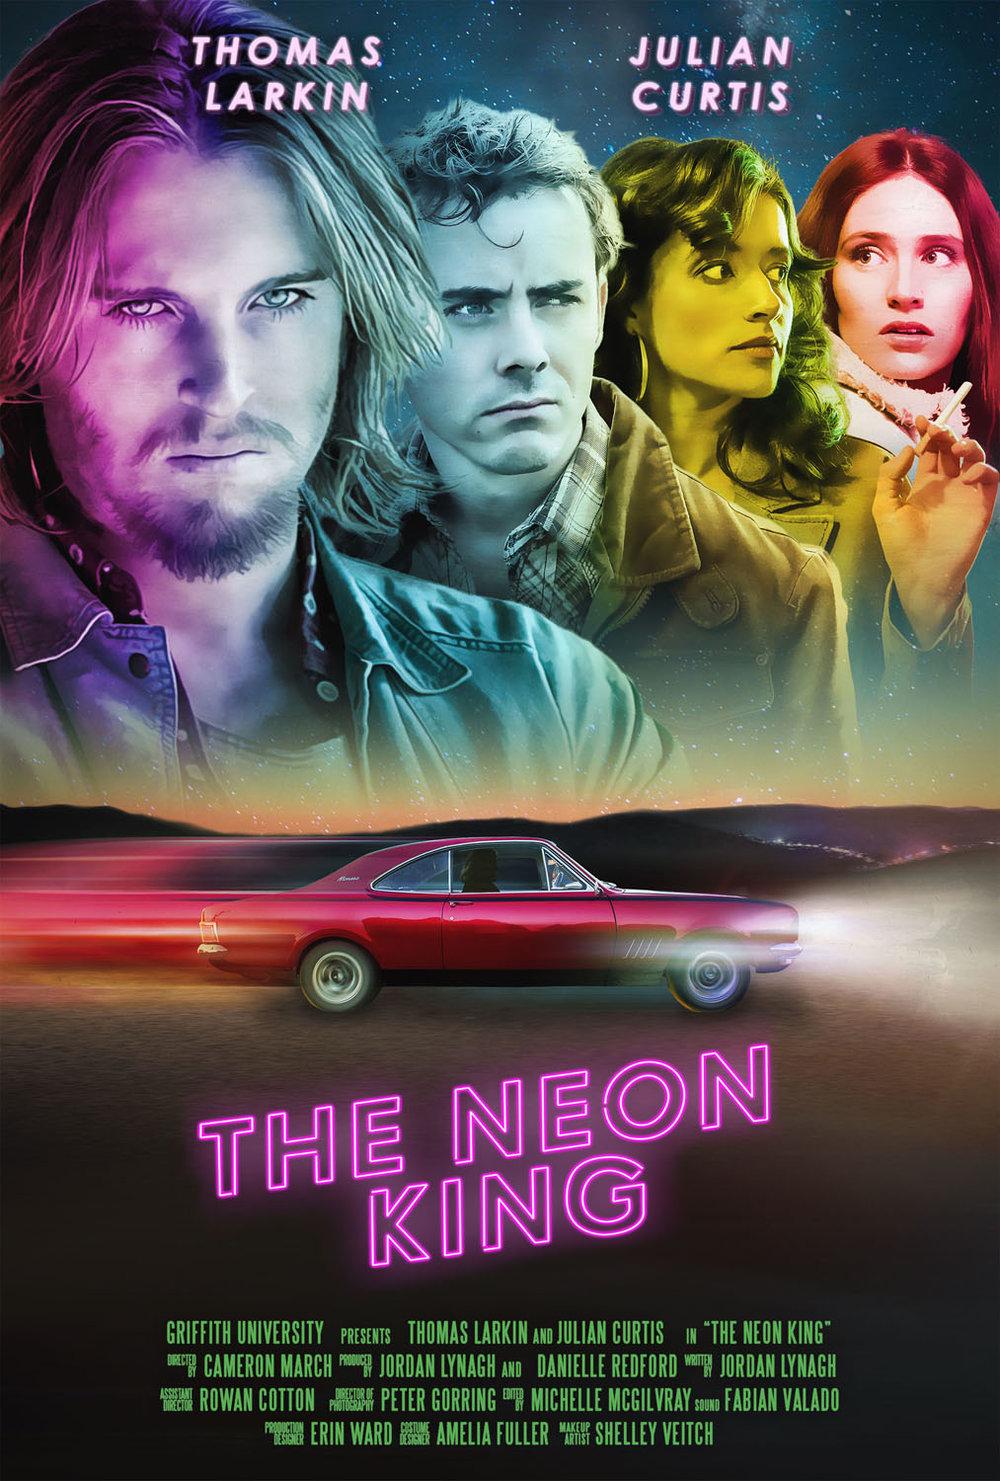 neon-king-1-sheet-web-10-16.jpg